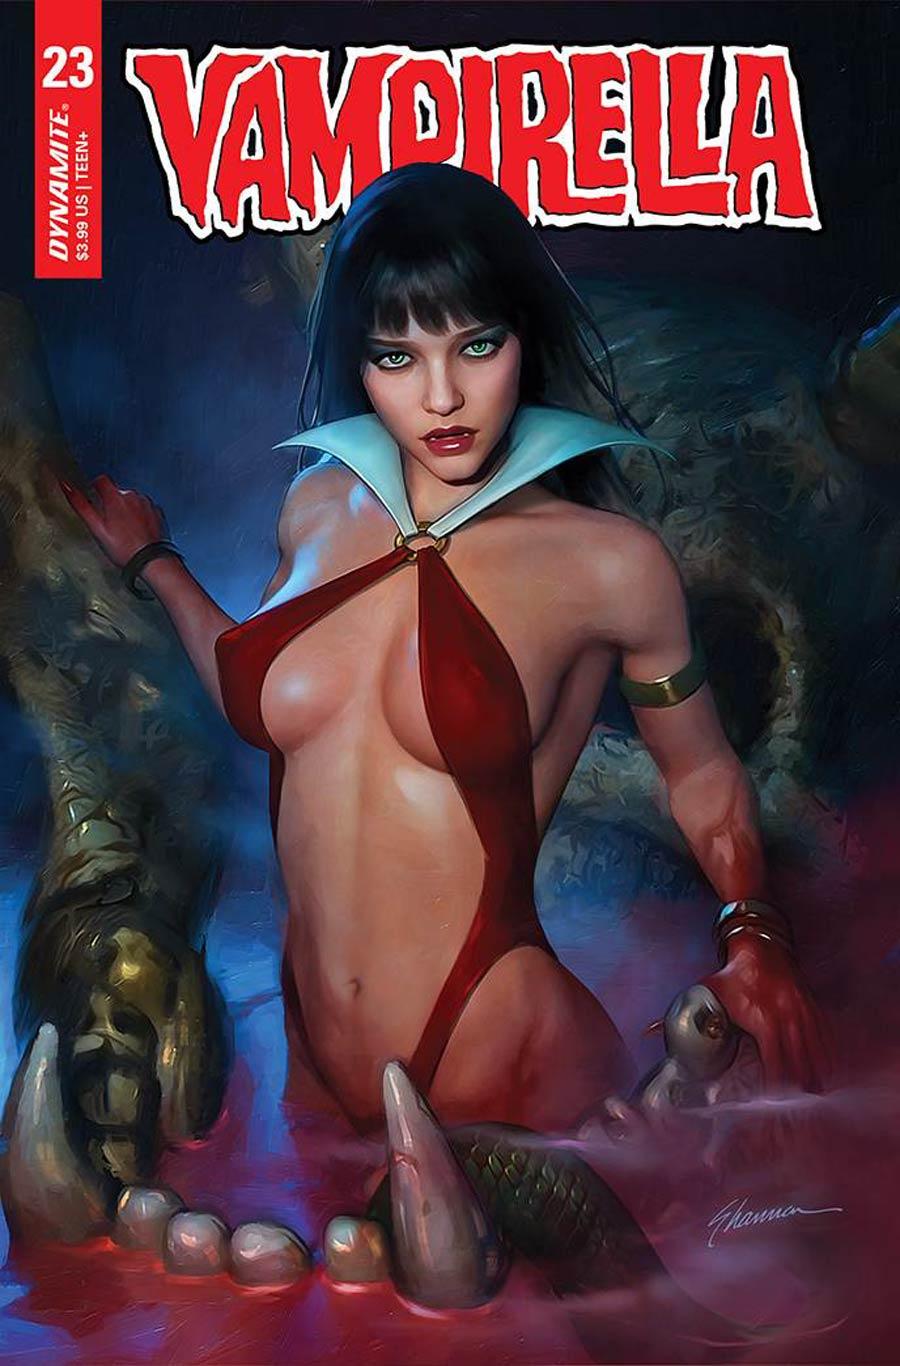 Vampirella Vol 8 #23 Cover C Variant Shannon Maer Cover